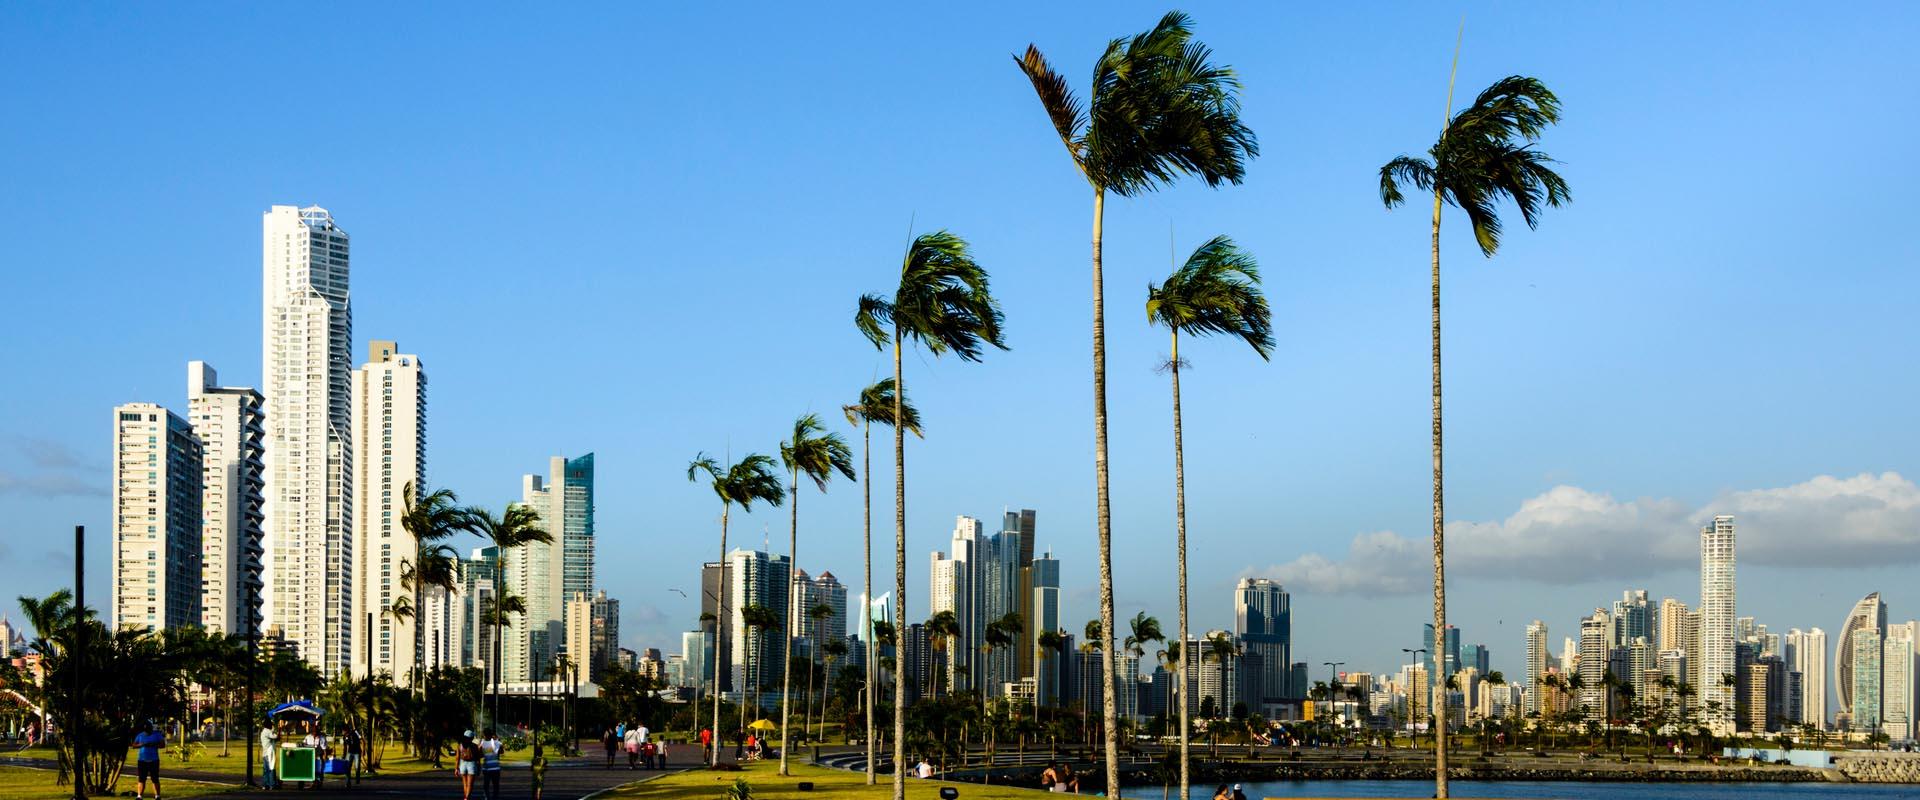 Panama Public Holidays 2019 - PublicHolidays com pa